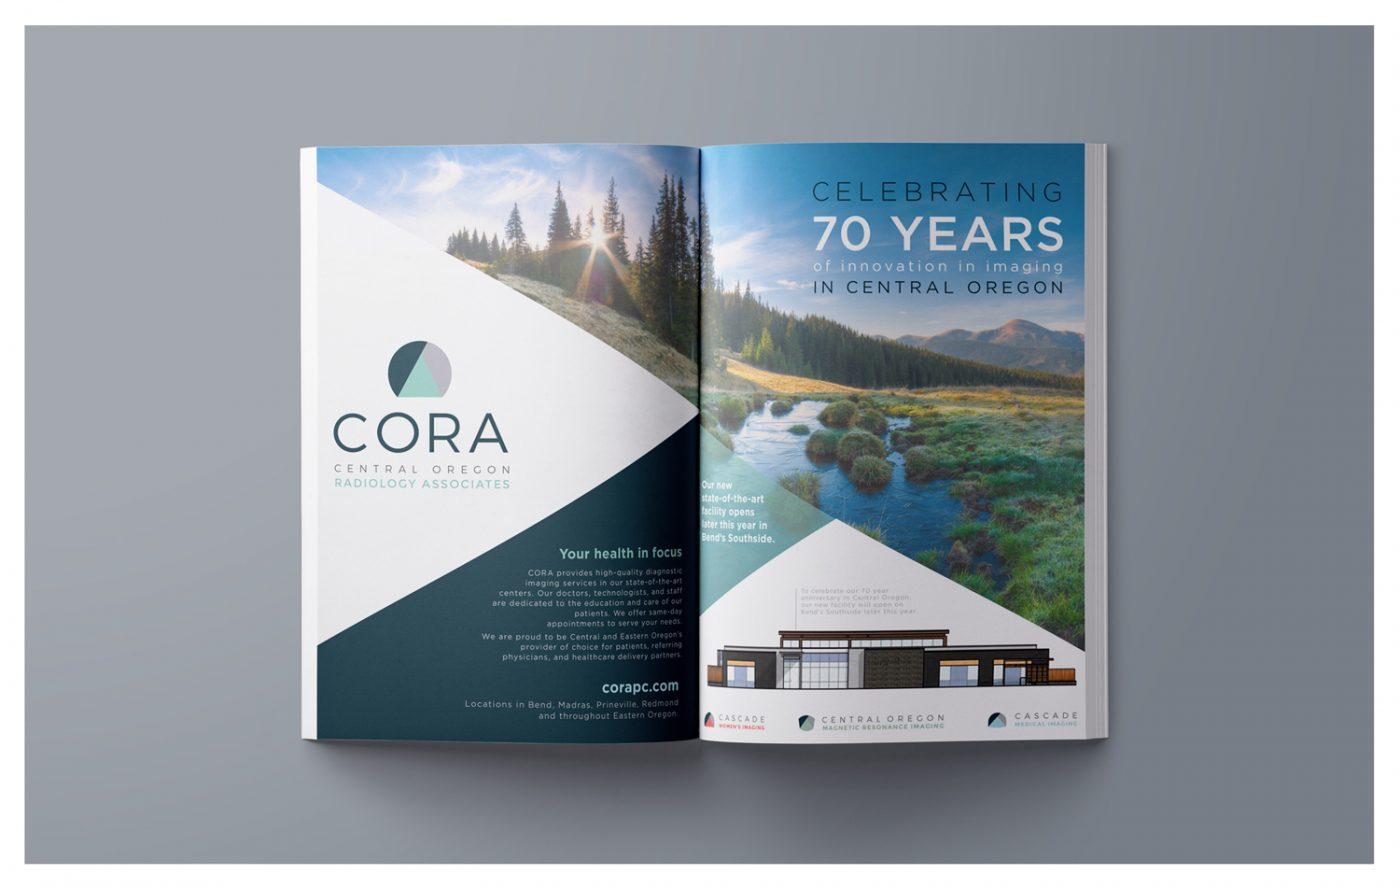 CORA-Magazine-case-study-savy-2